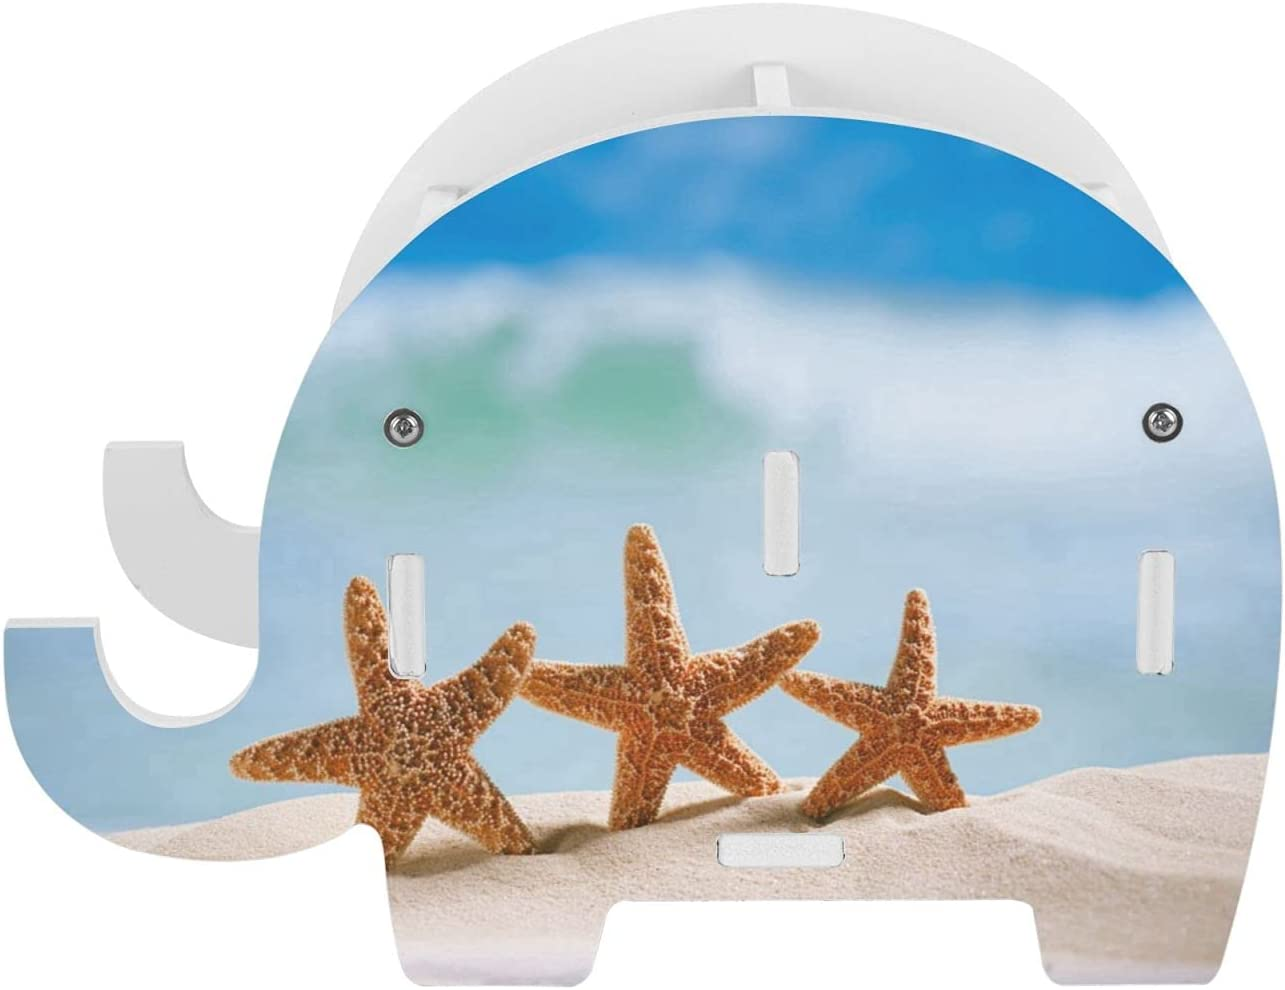 ZXZNC Starfish Waves Genuine Splashing On Beach Blue Max 53% OFF Sky Holder Pen for